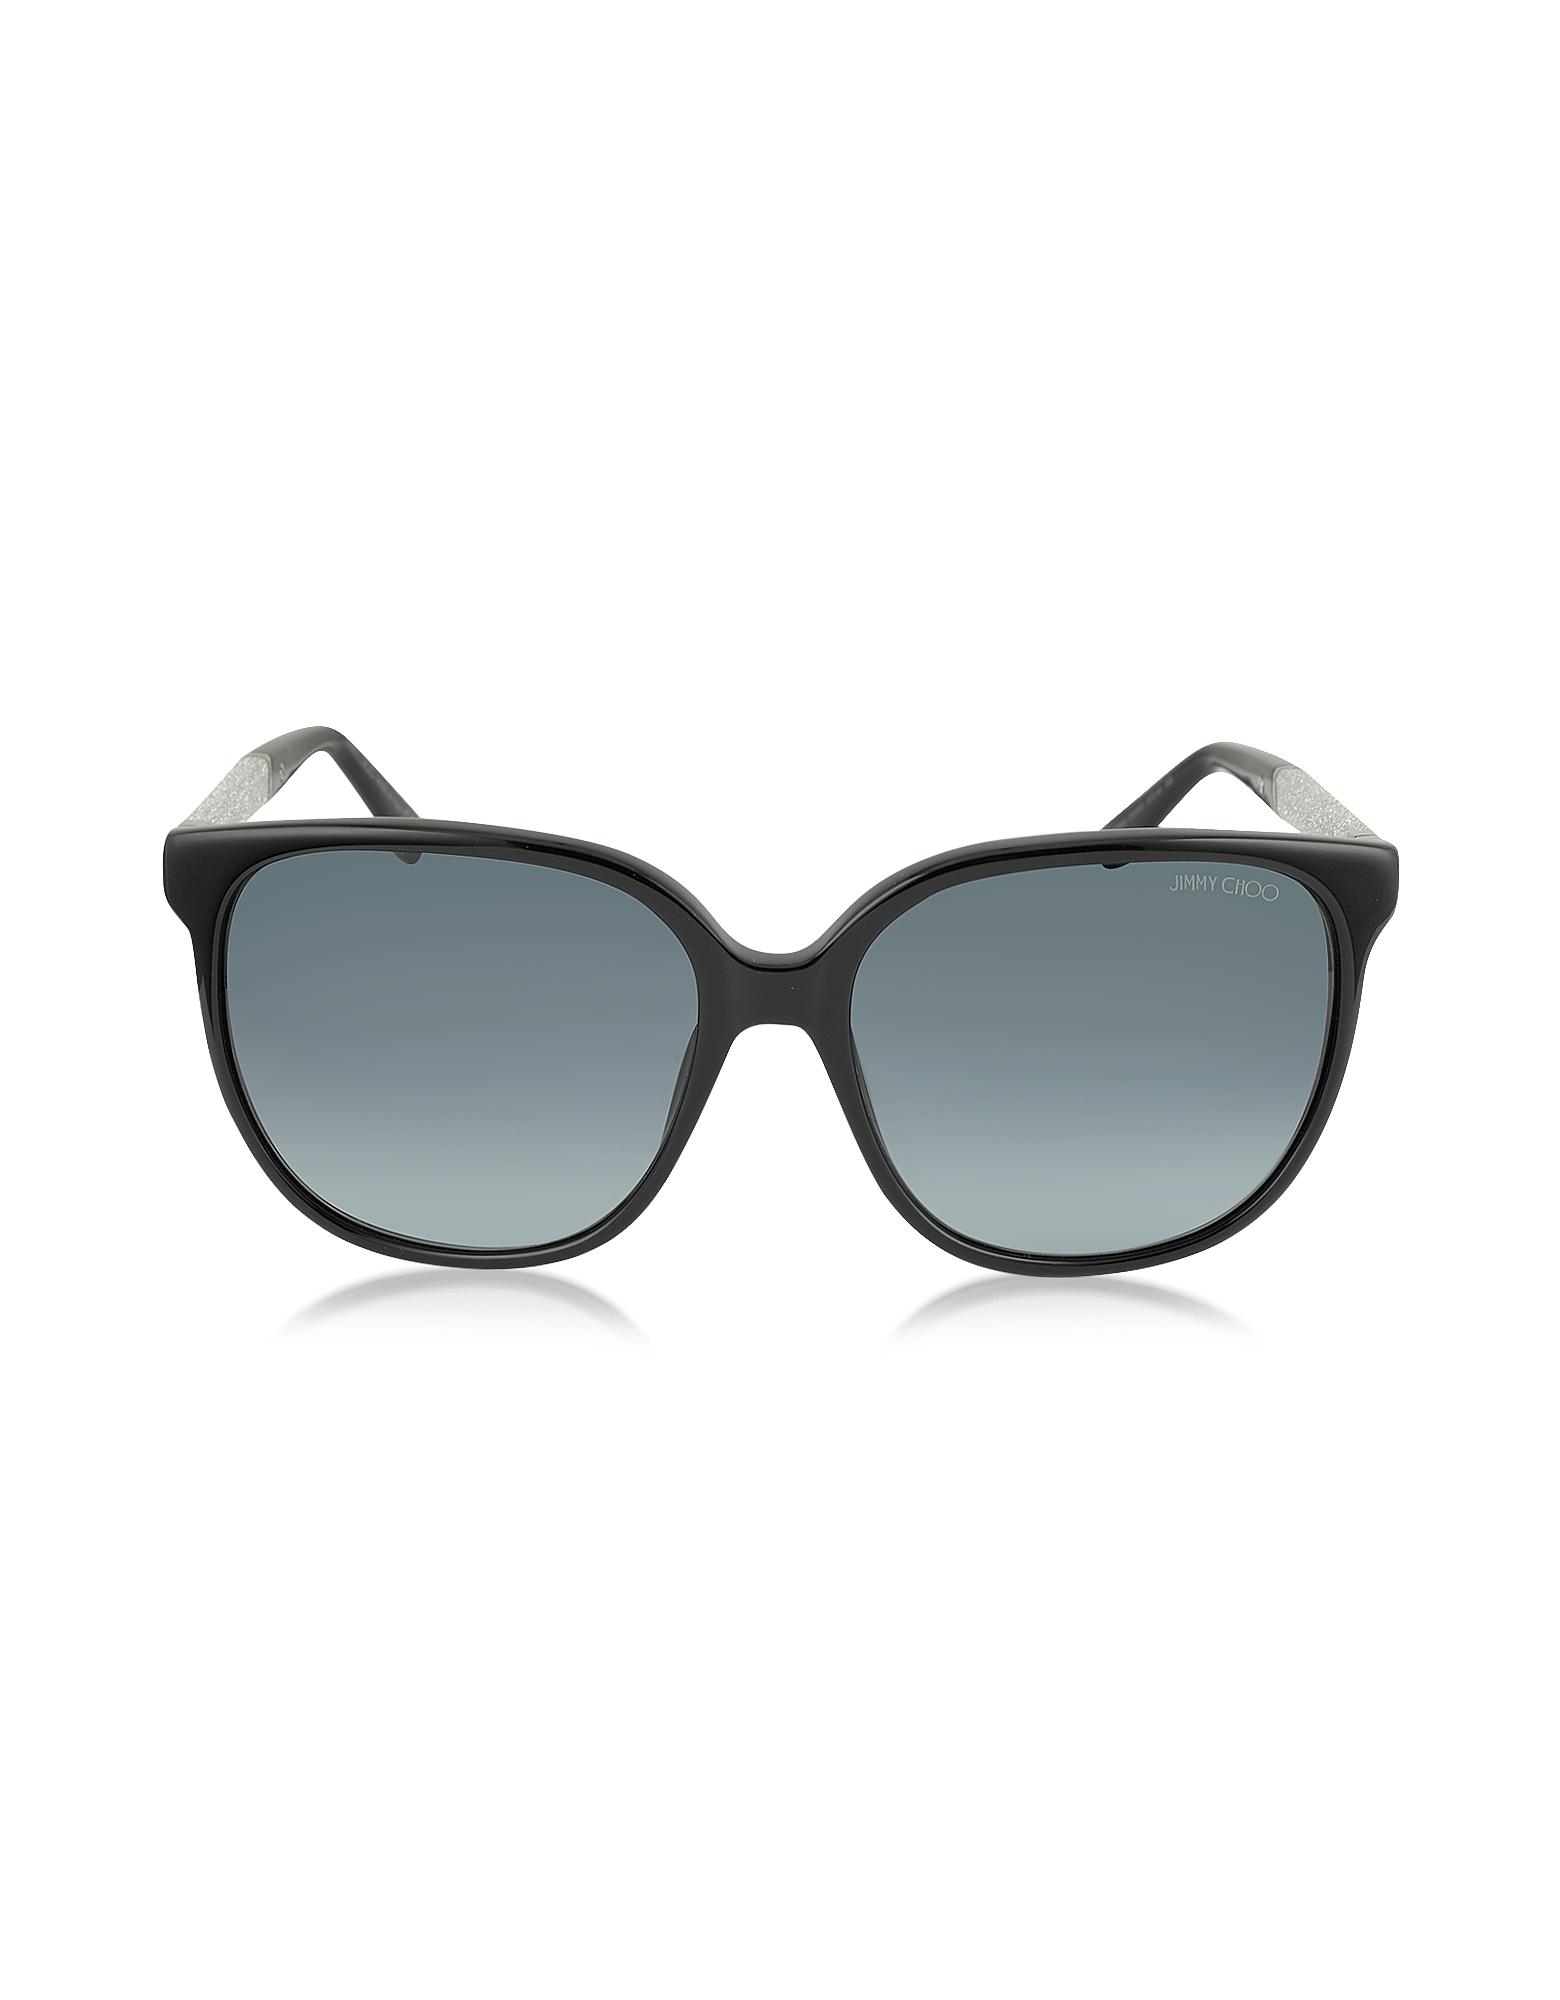 Jimmy Choo Sunglasses, PAULA/S Acetate Women's Sunglasses